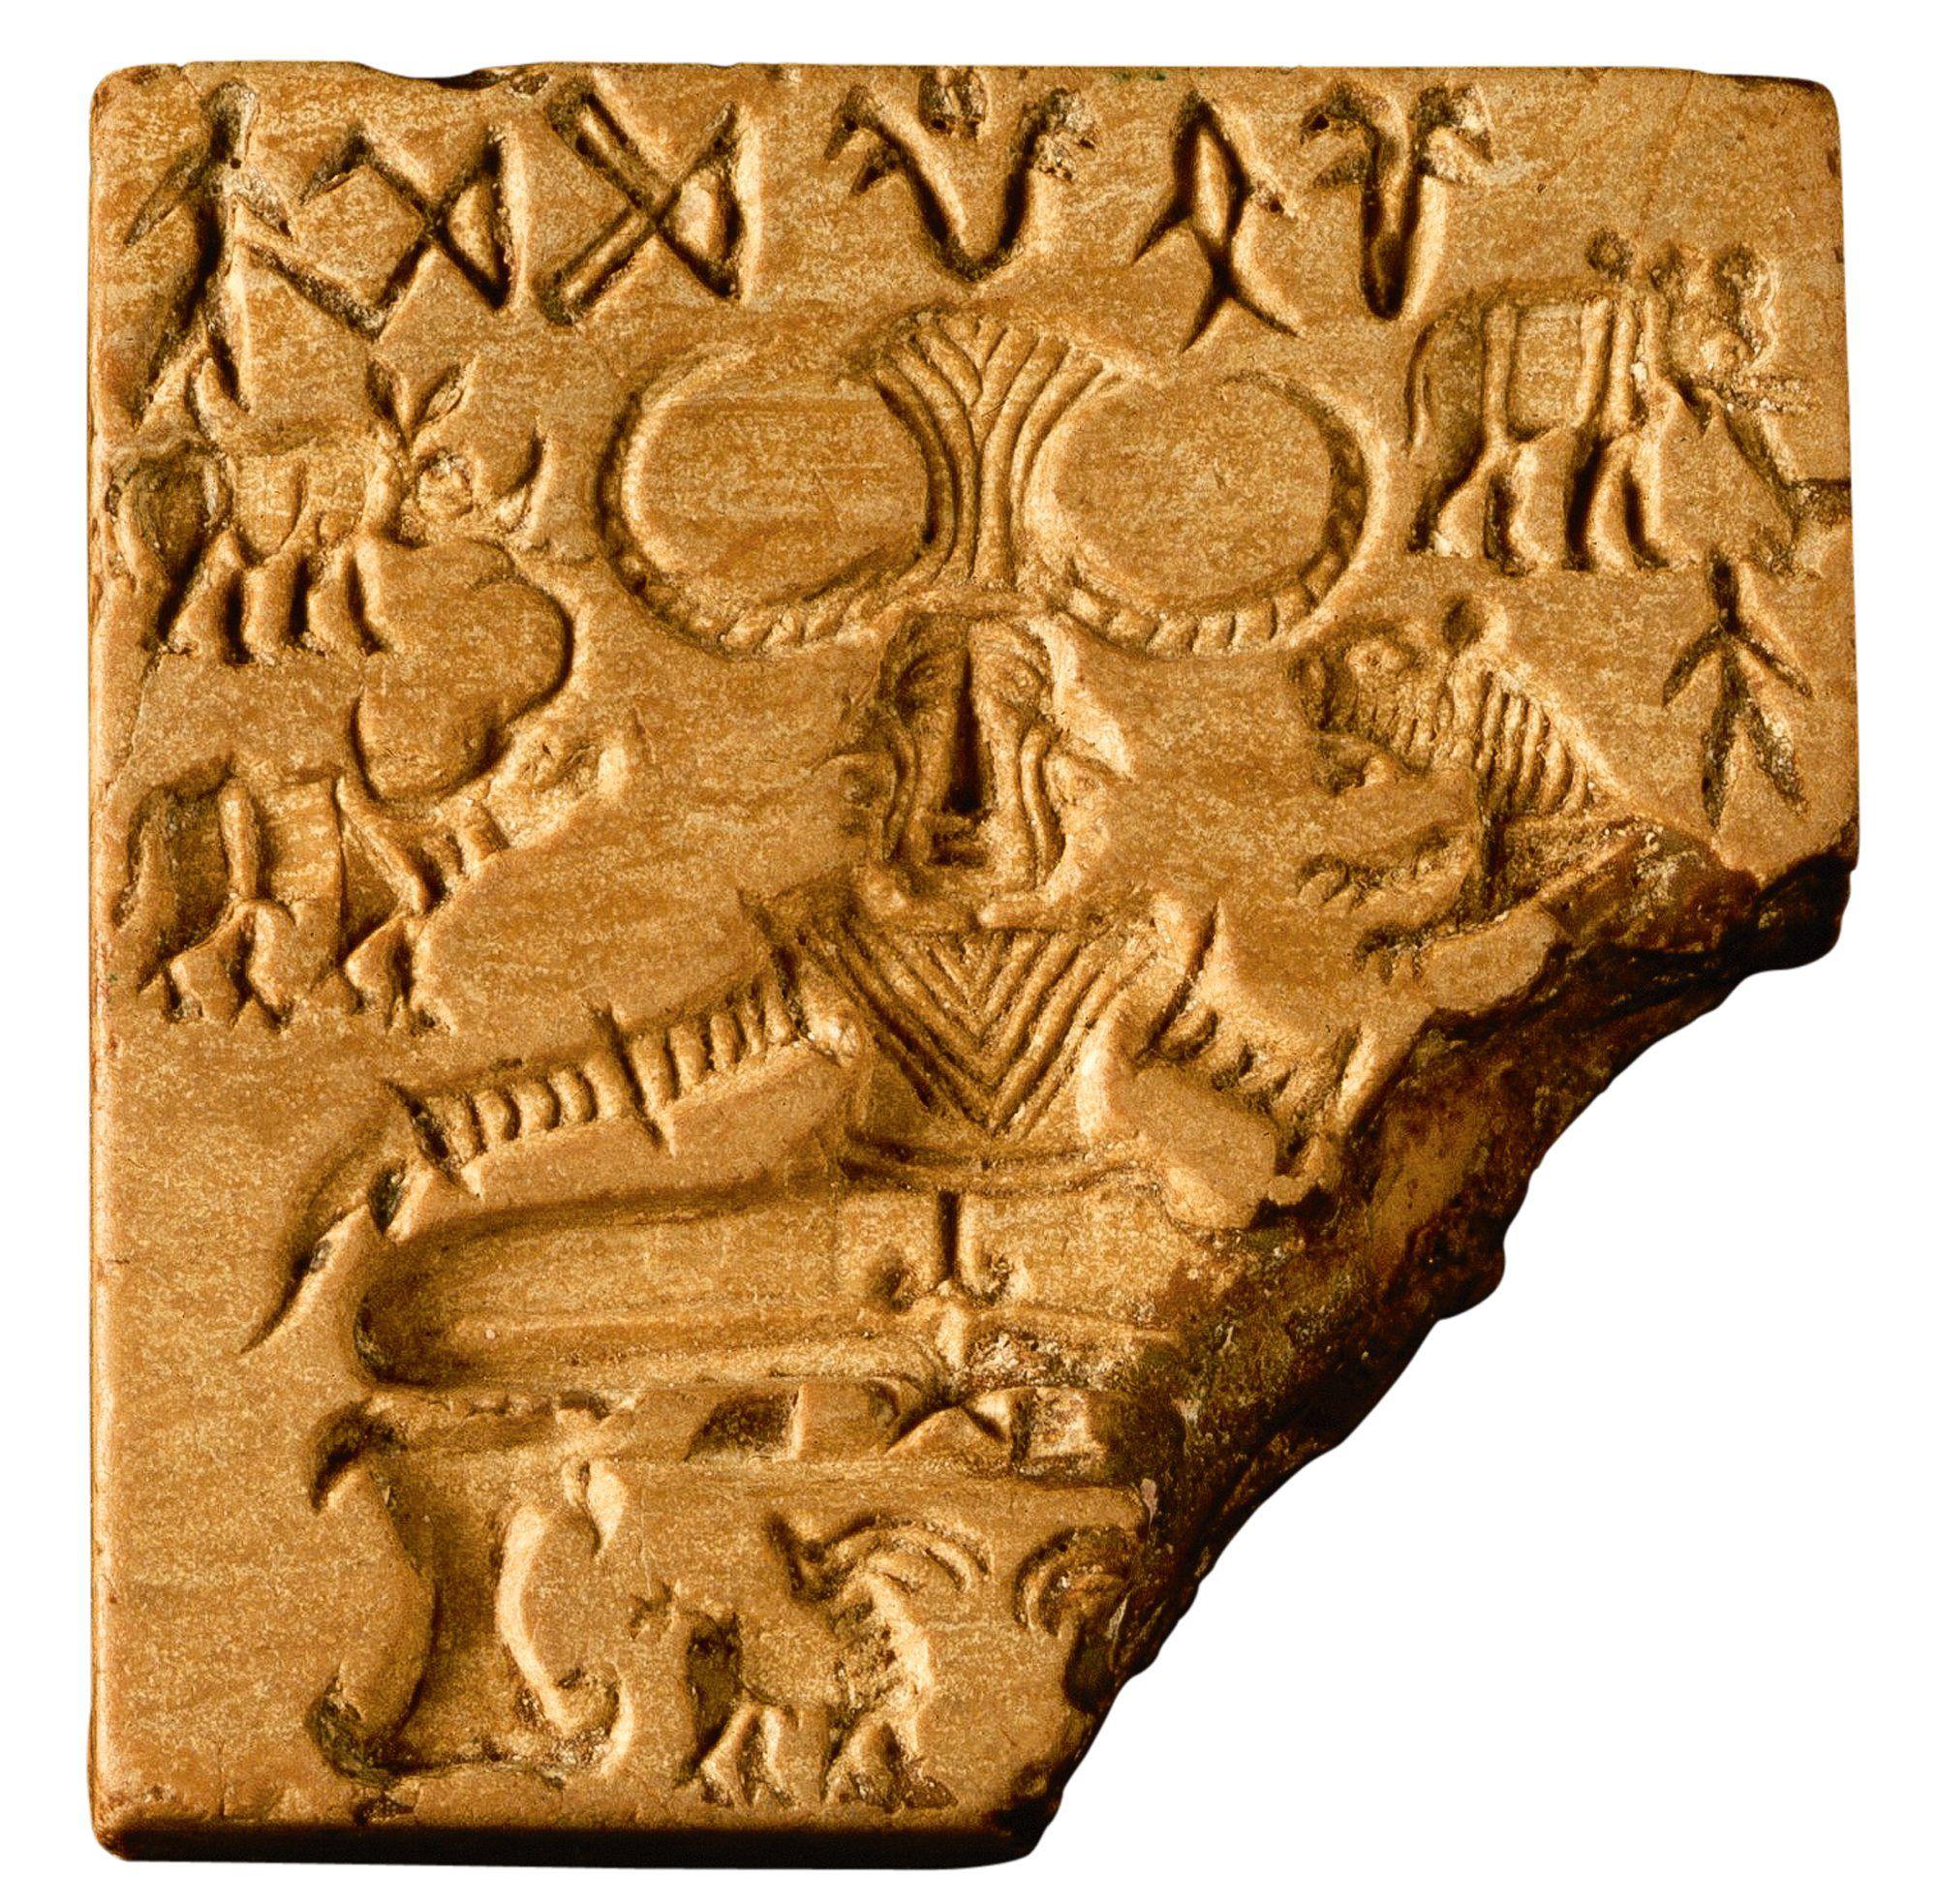 Ancient Indus Valley Civilization Artifacts